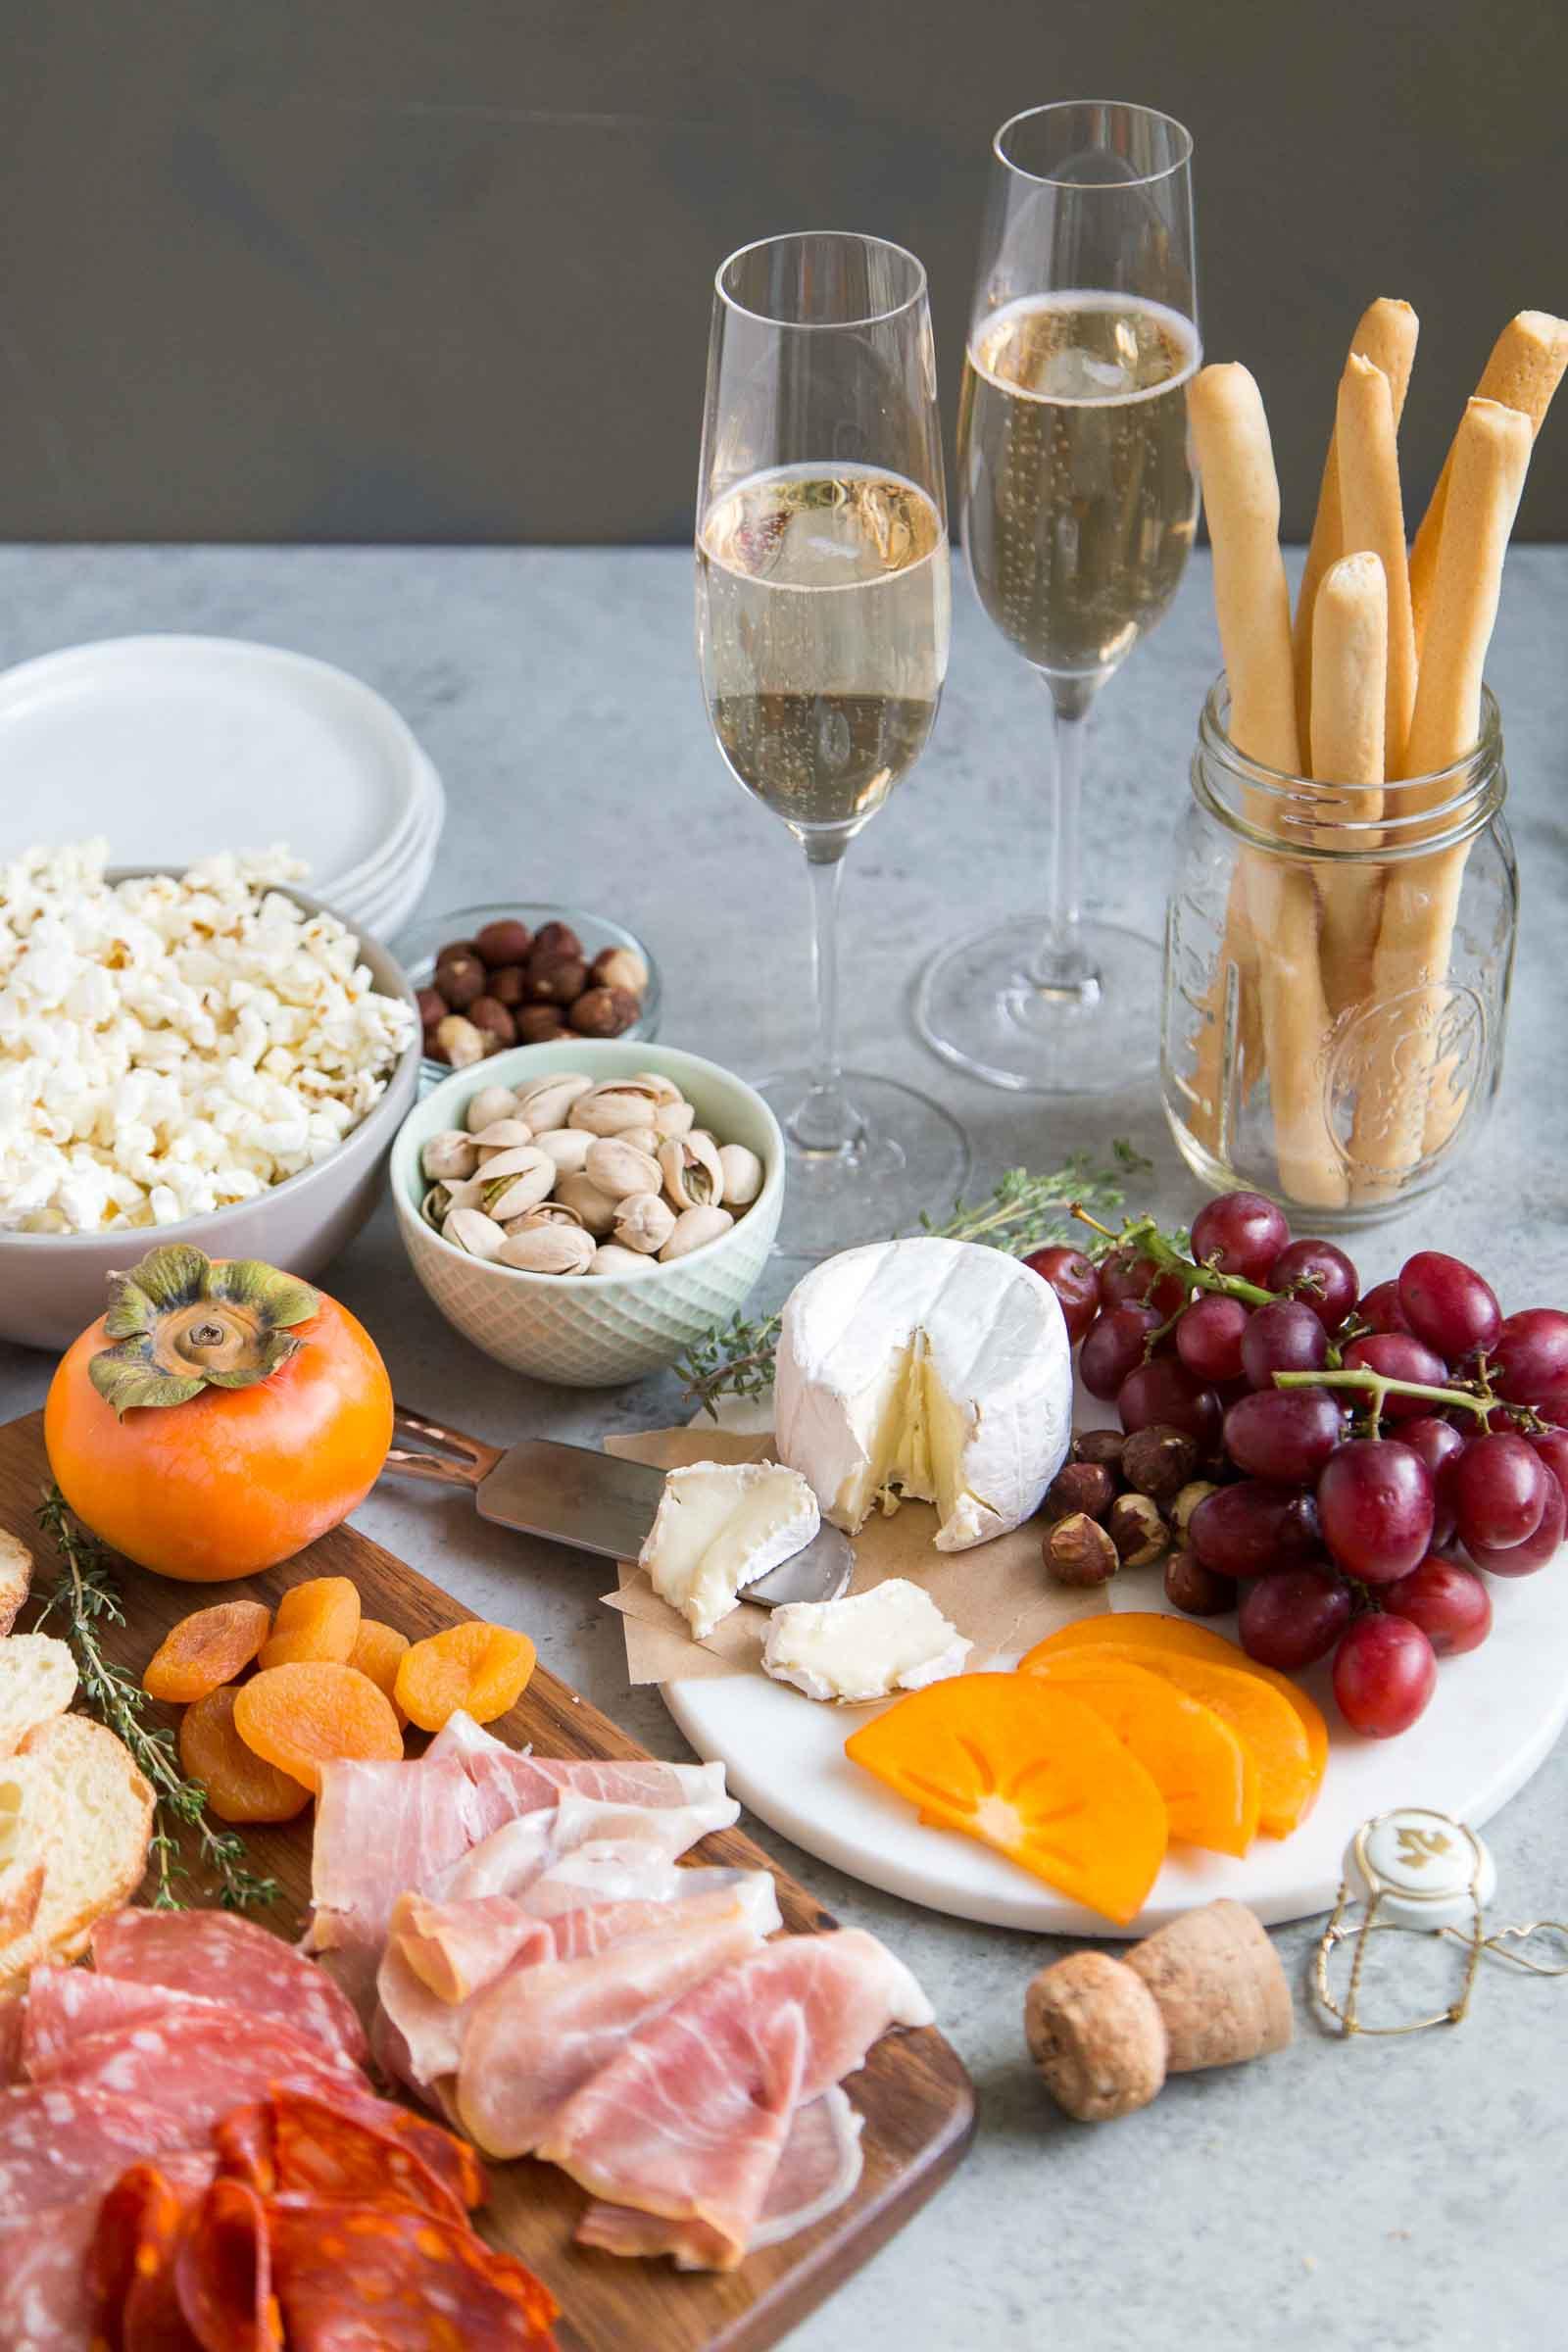 Sparkling Wine Food Pairing The Little Epicurean